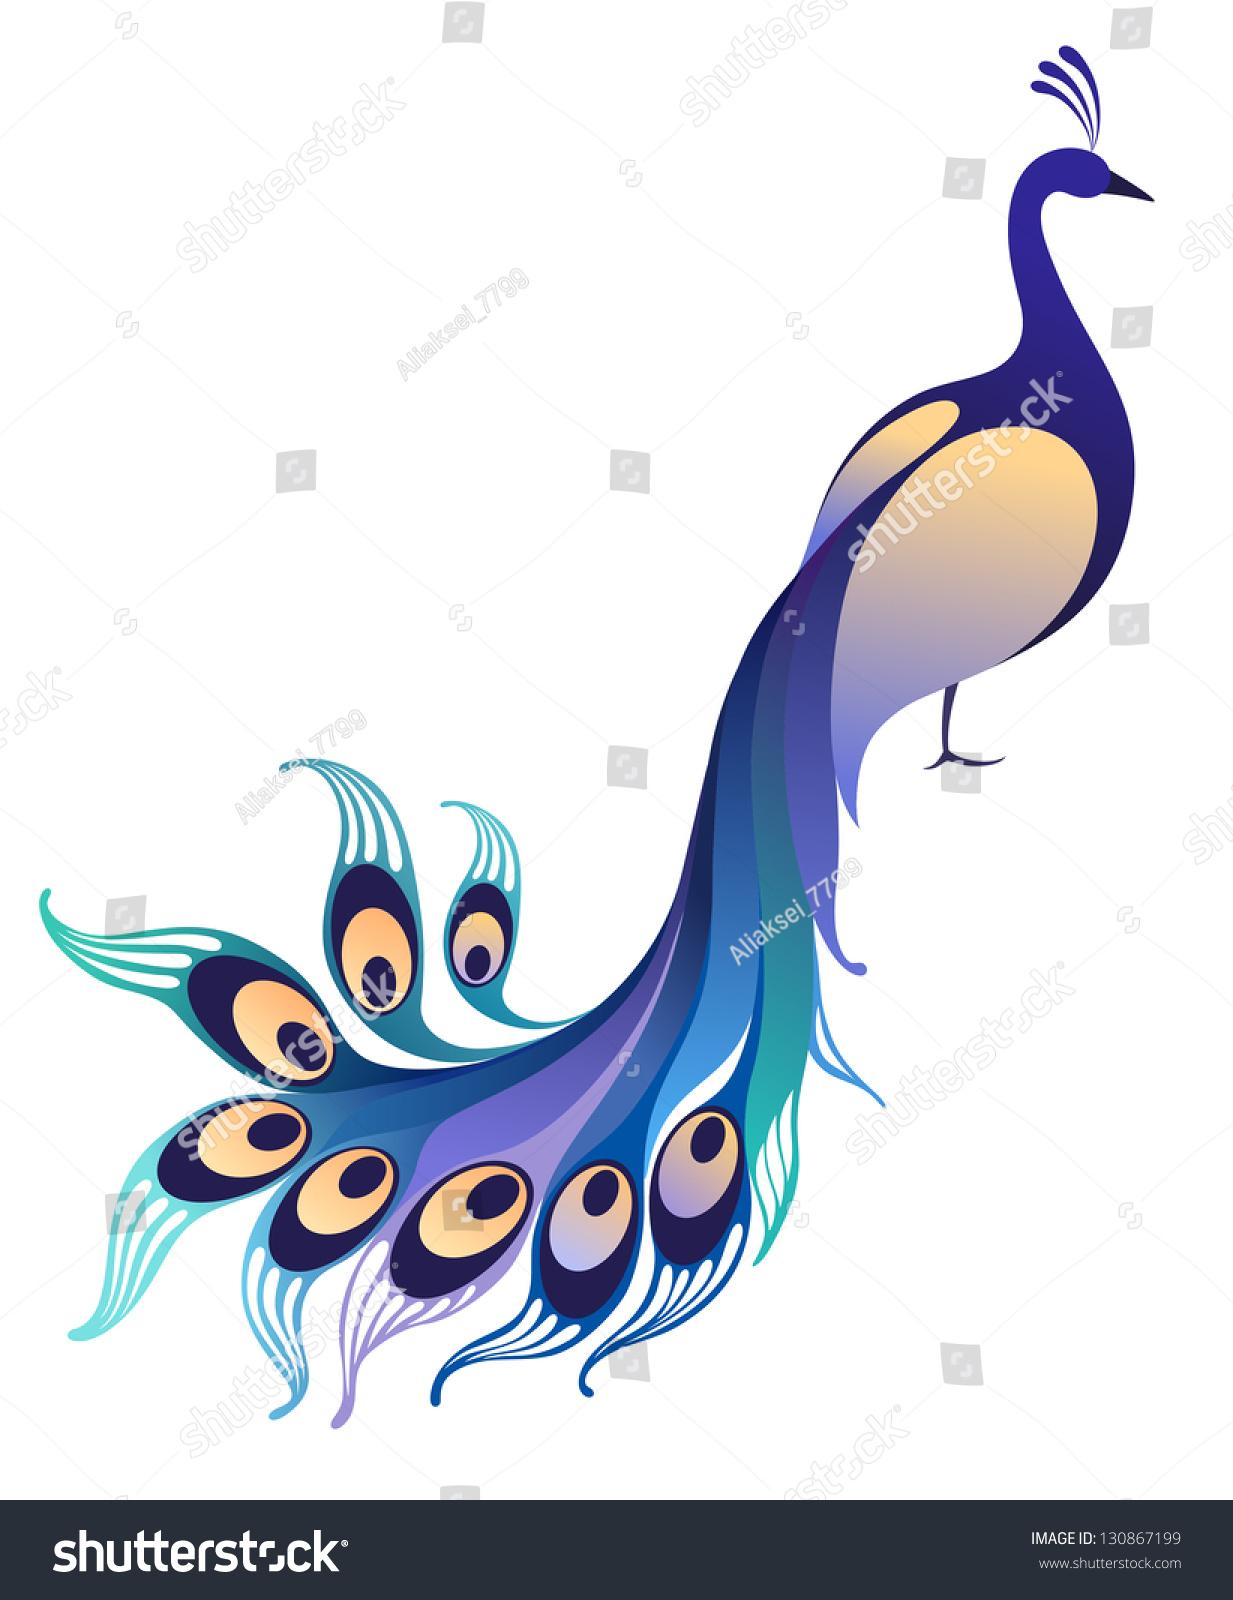 Peacock. Abstract Bird On White Background Stock Vector Illustration 130867199 : Shutterstock